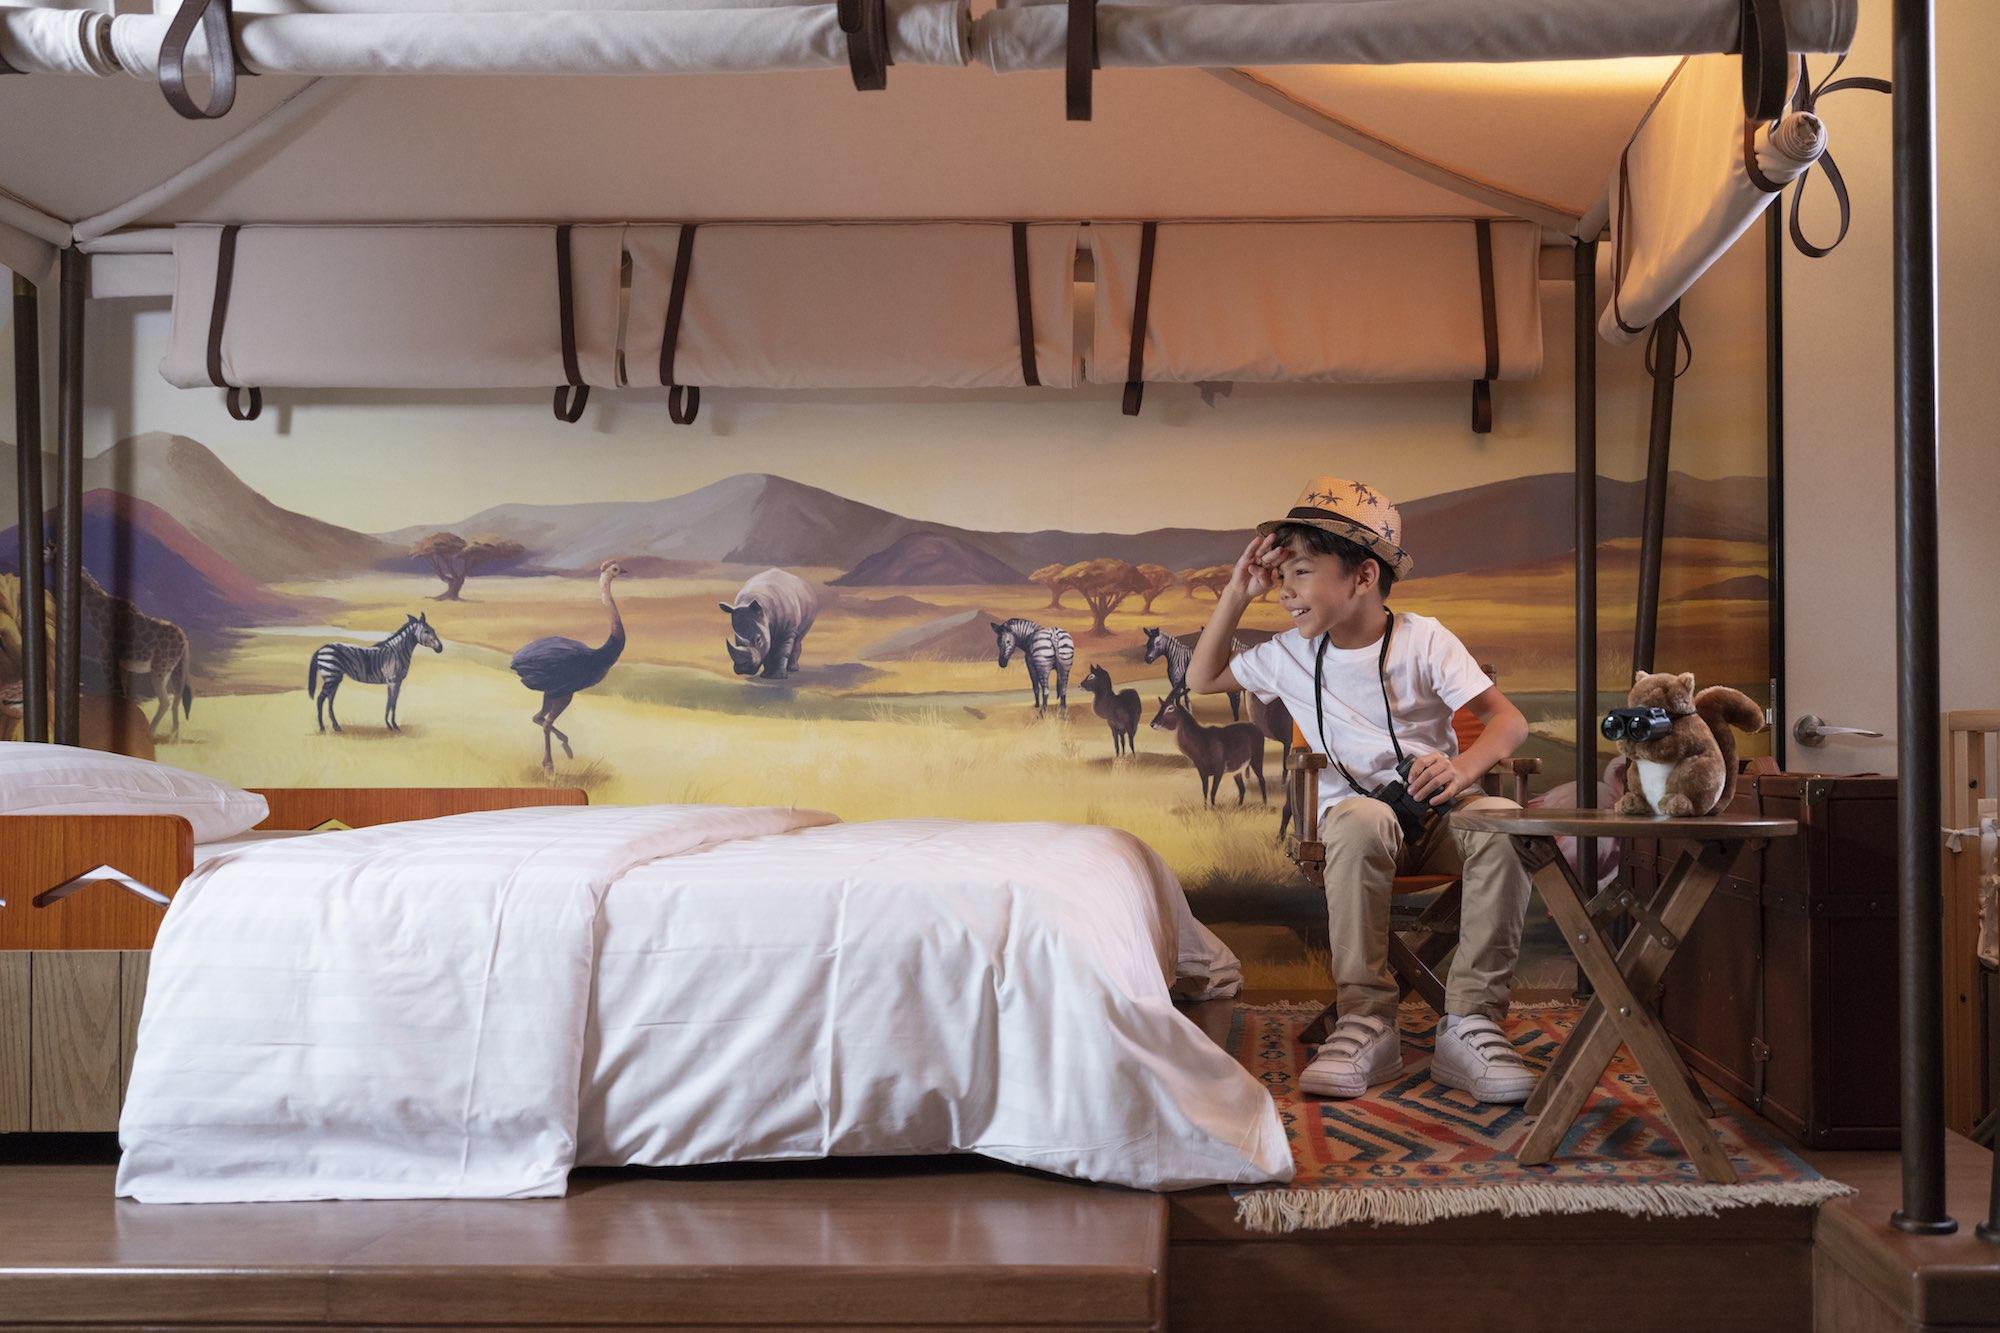 Hospitality Photography Interior Hotel Singapore Coco Creative Studio 39-7